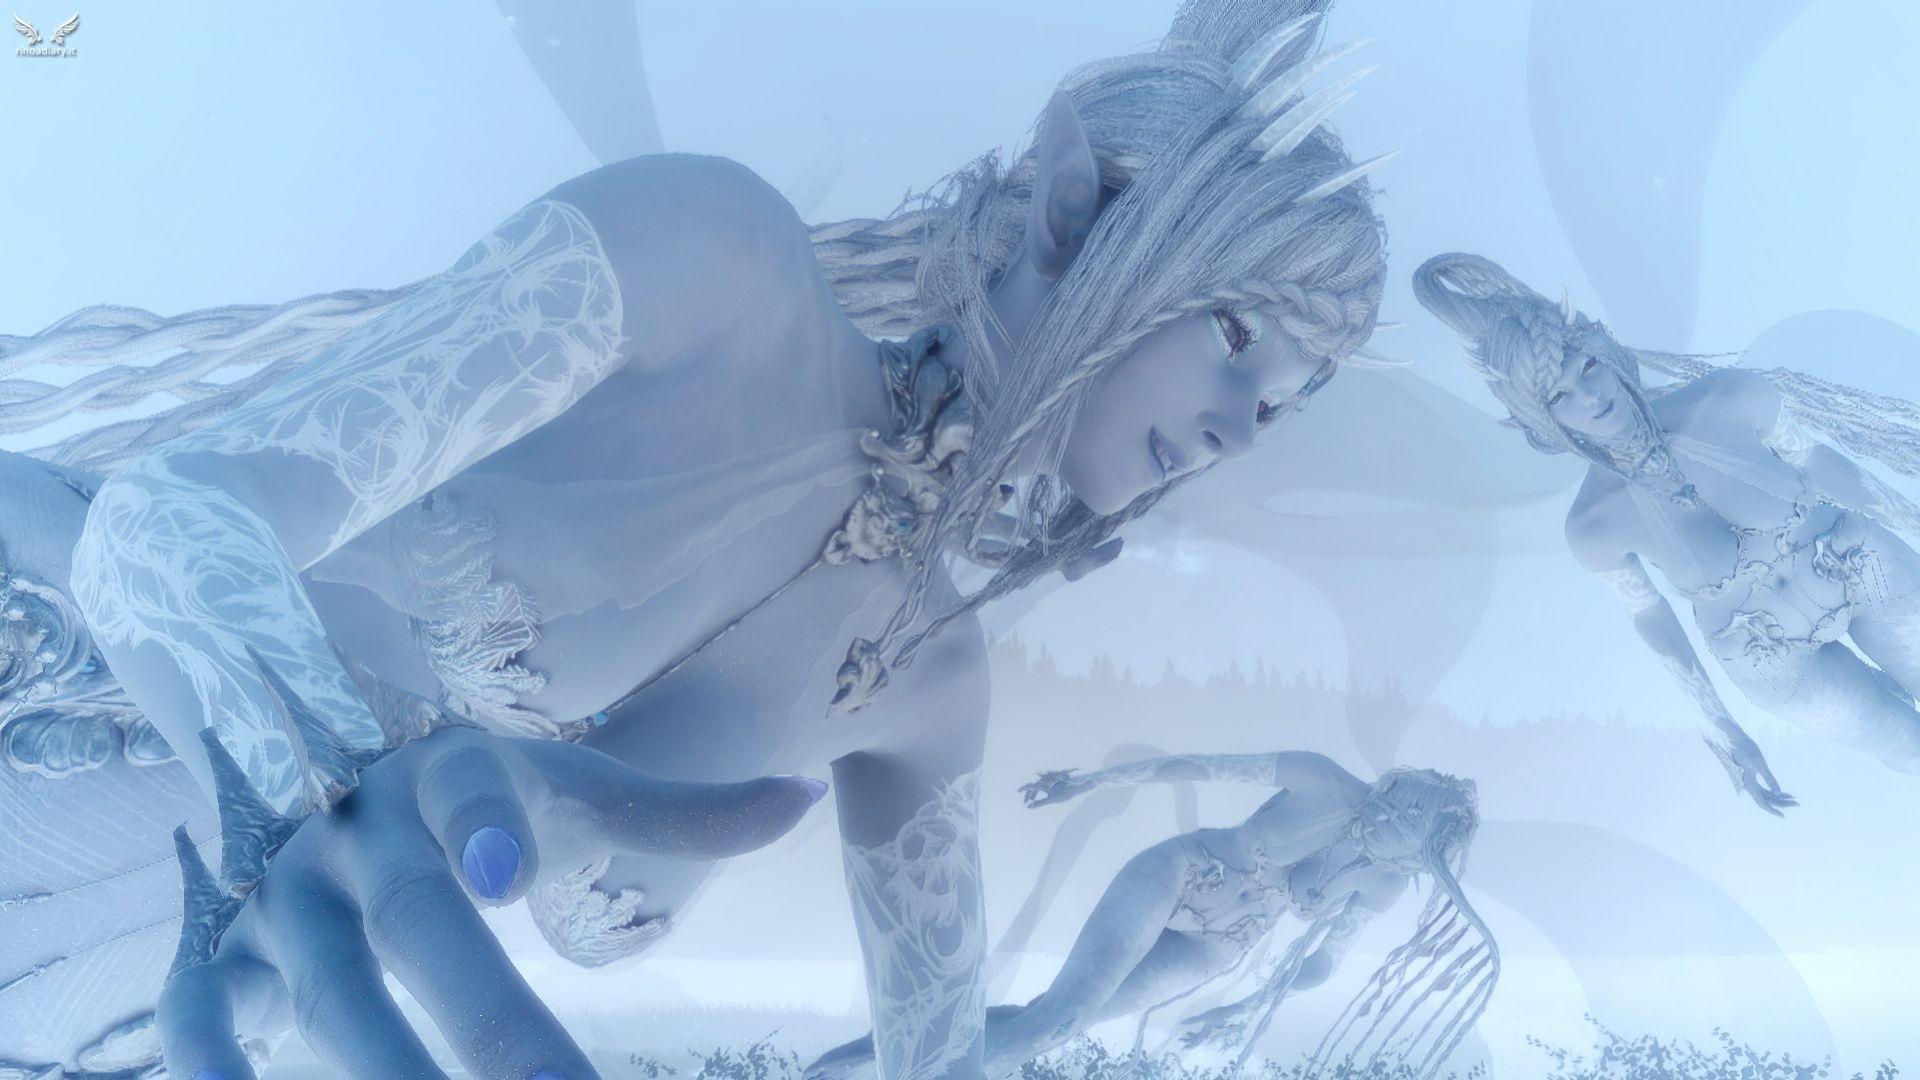 Final Fantasy XV - TGS 2016 - Shiva #2